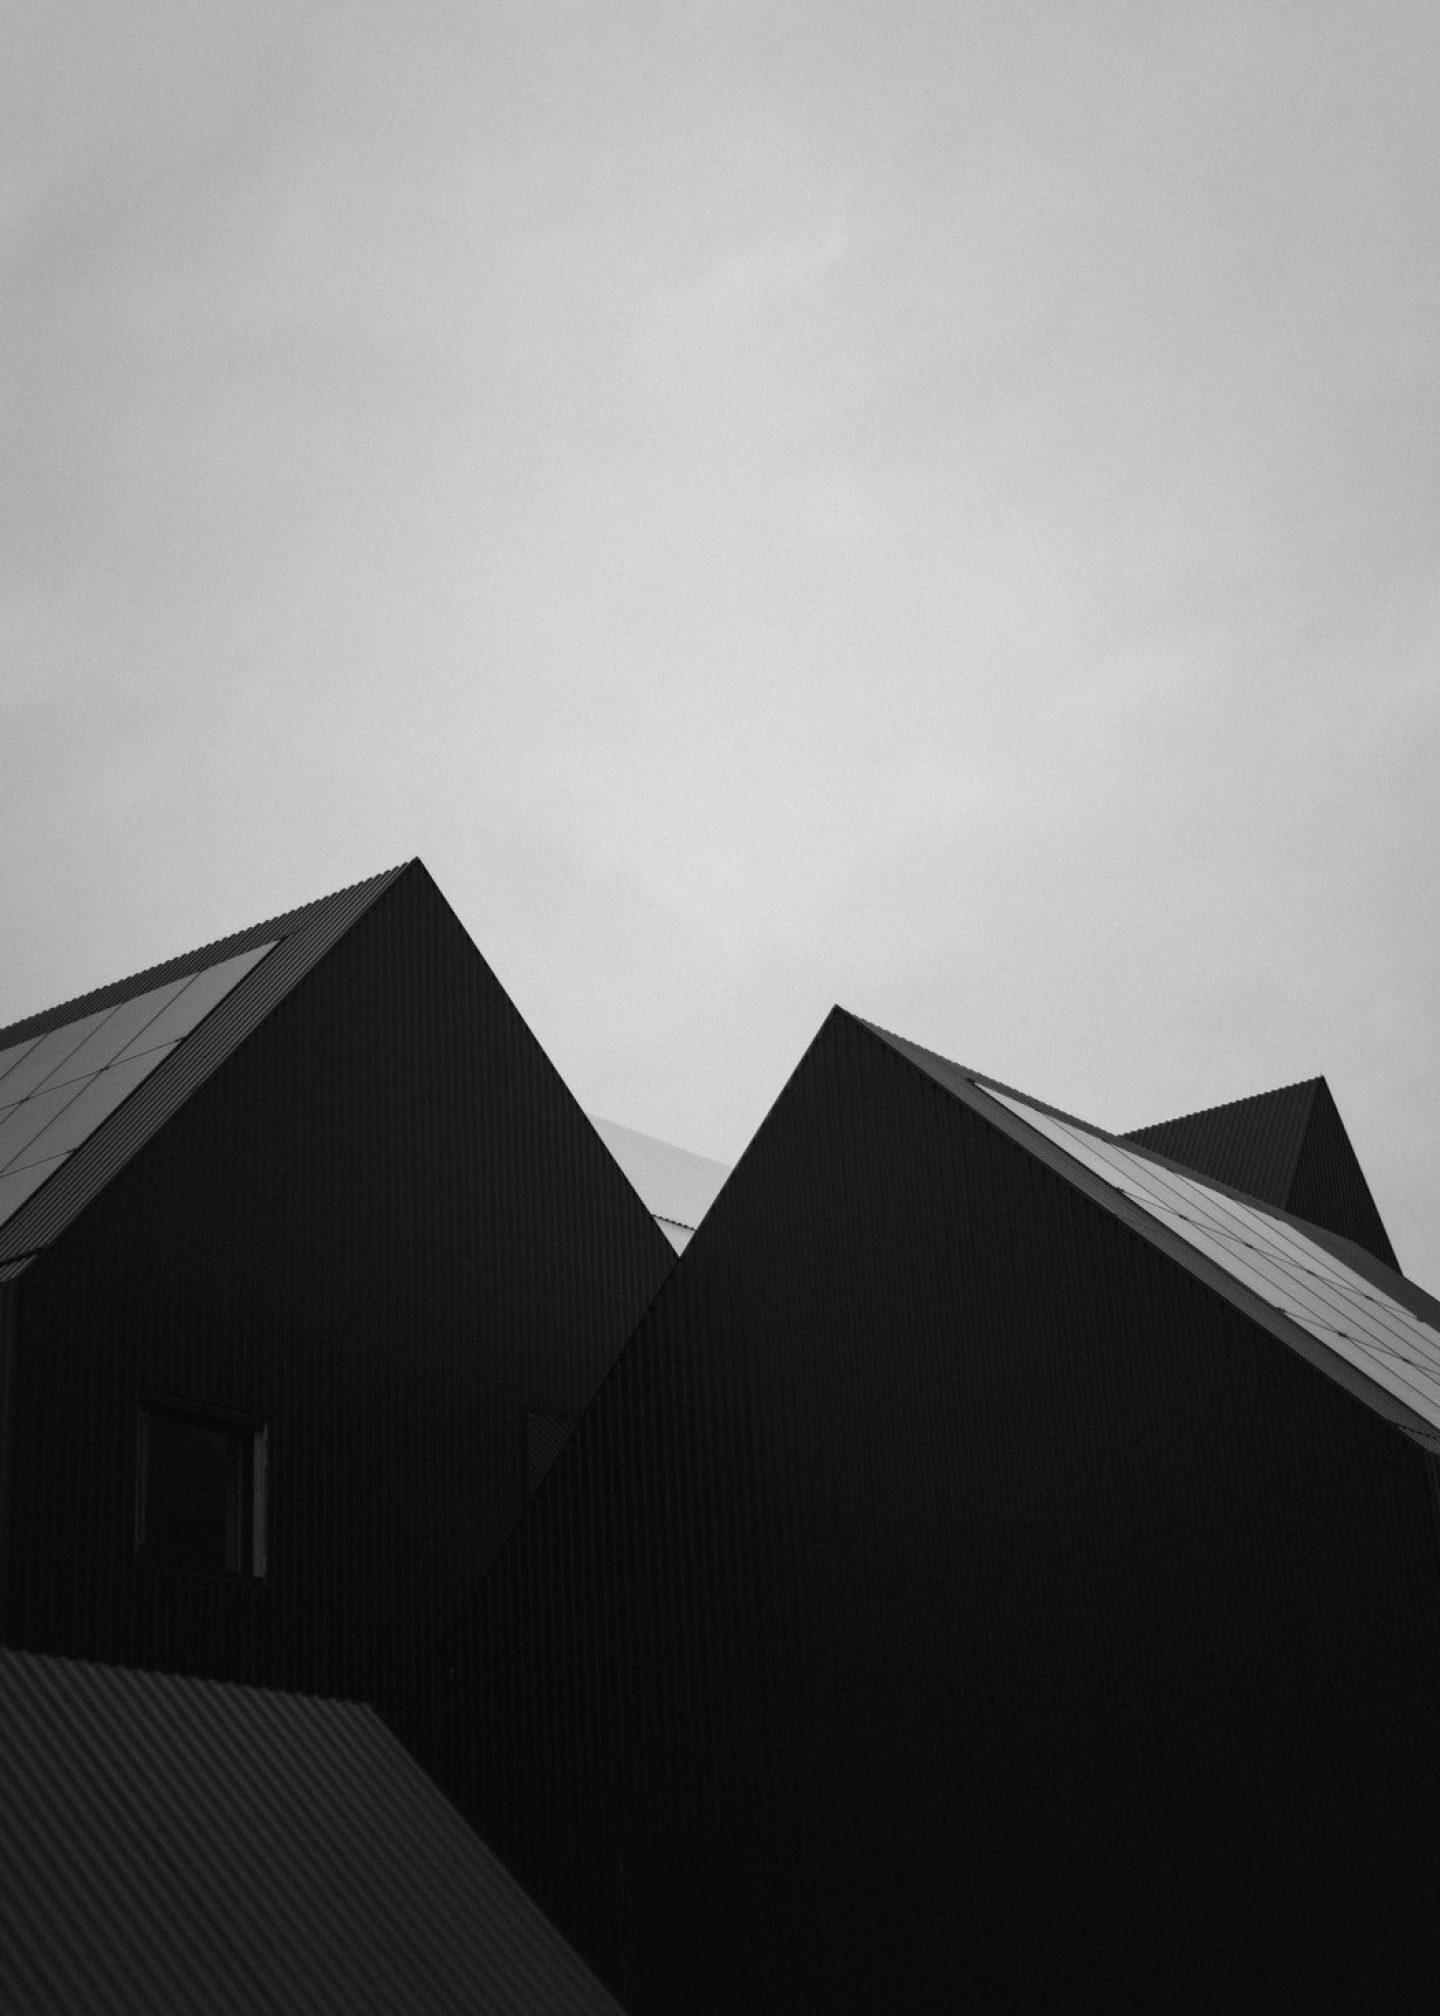 kim_holtermand_architecture-10-kopiowanie